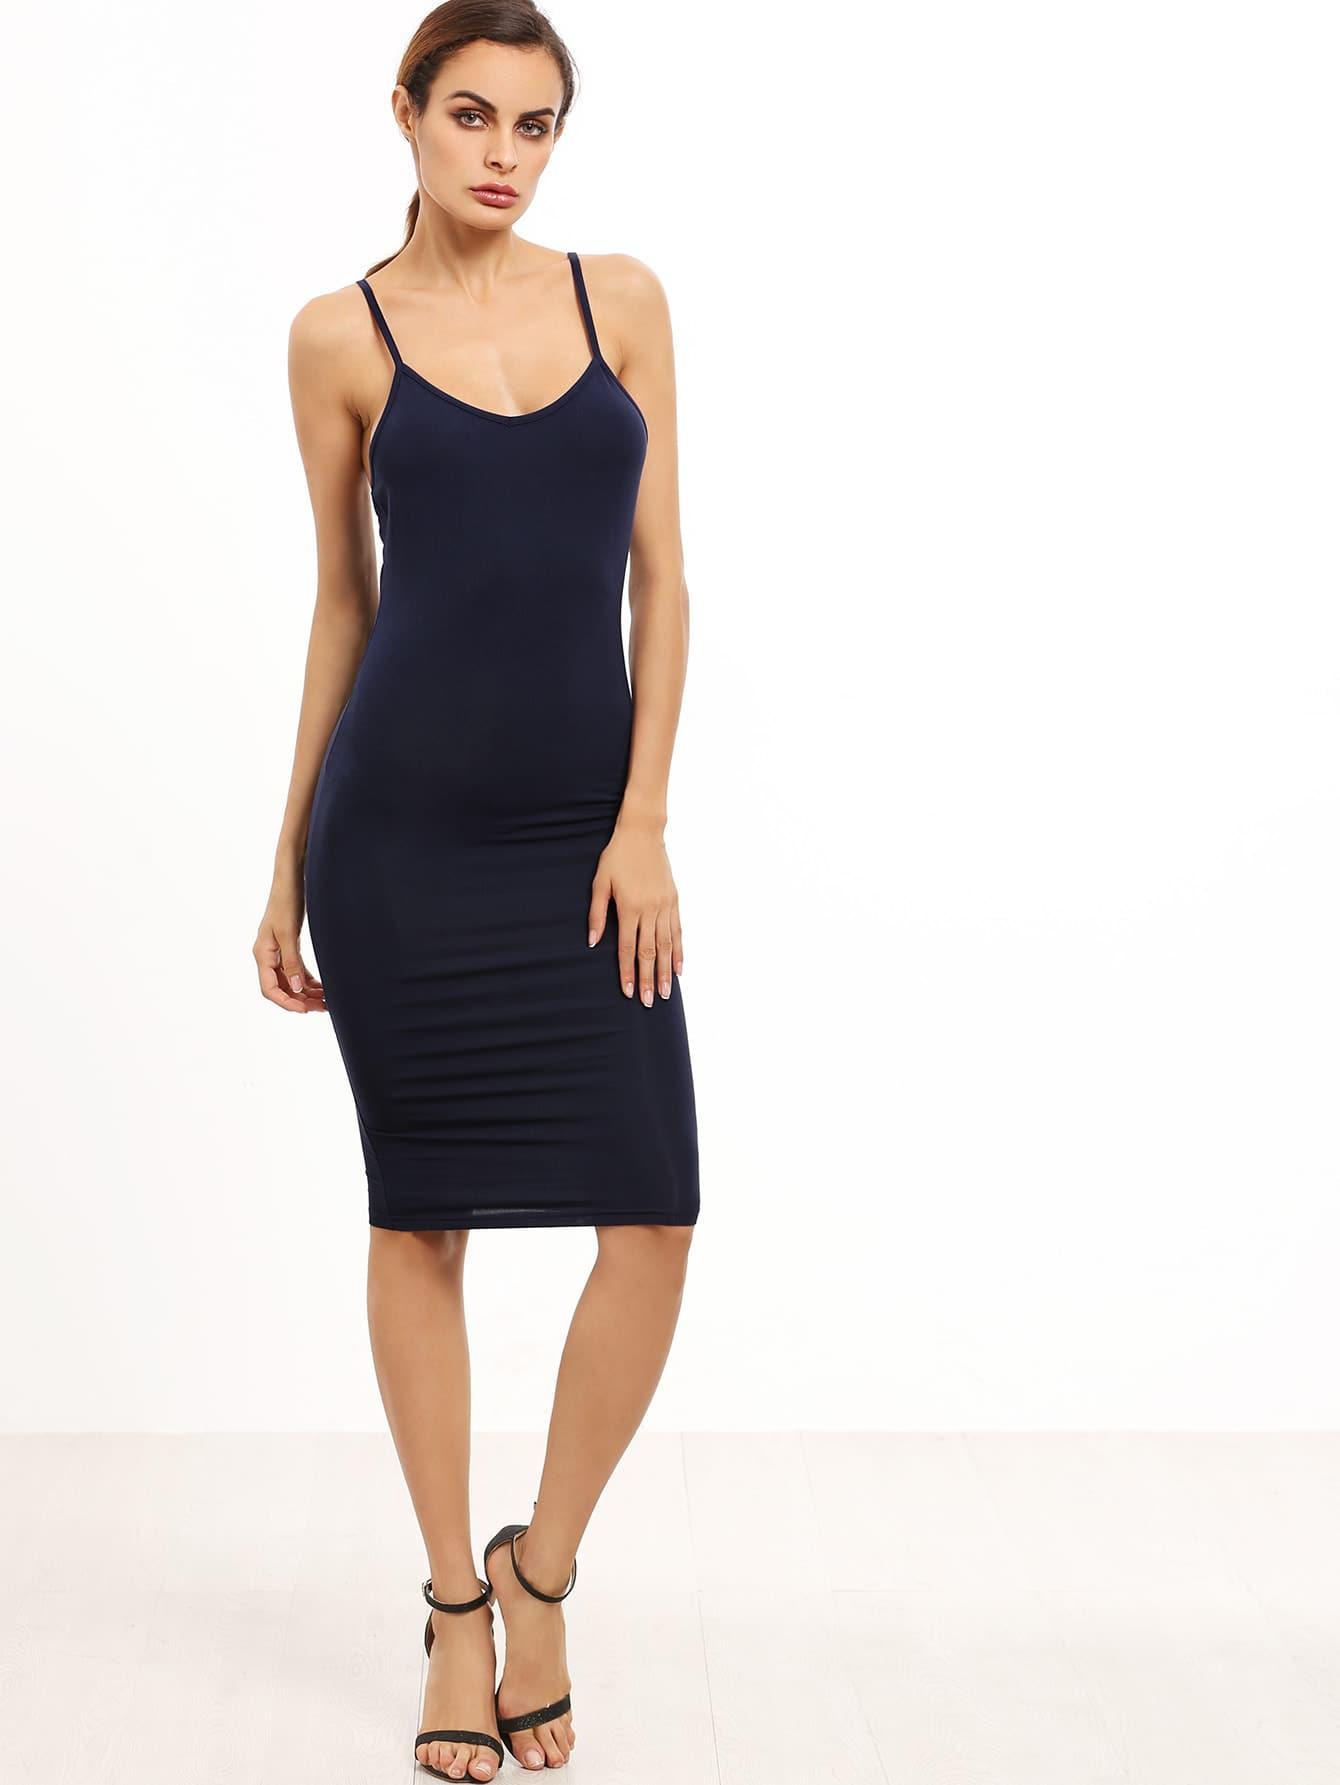 Navy Spaghetti Strap Sheath Dress dress160720762